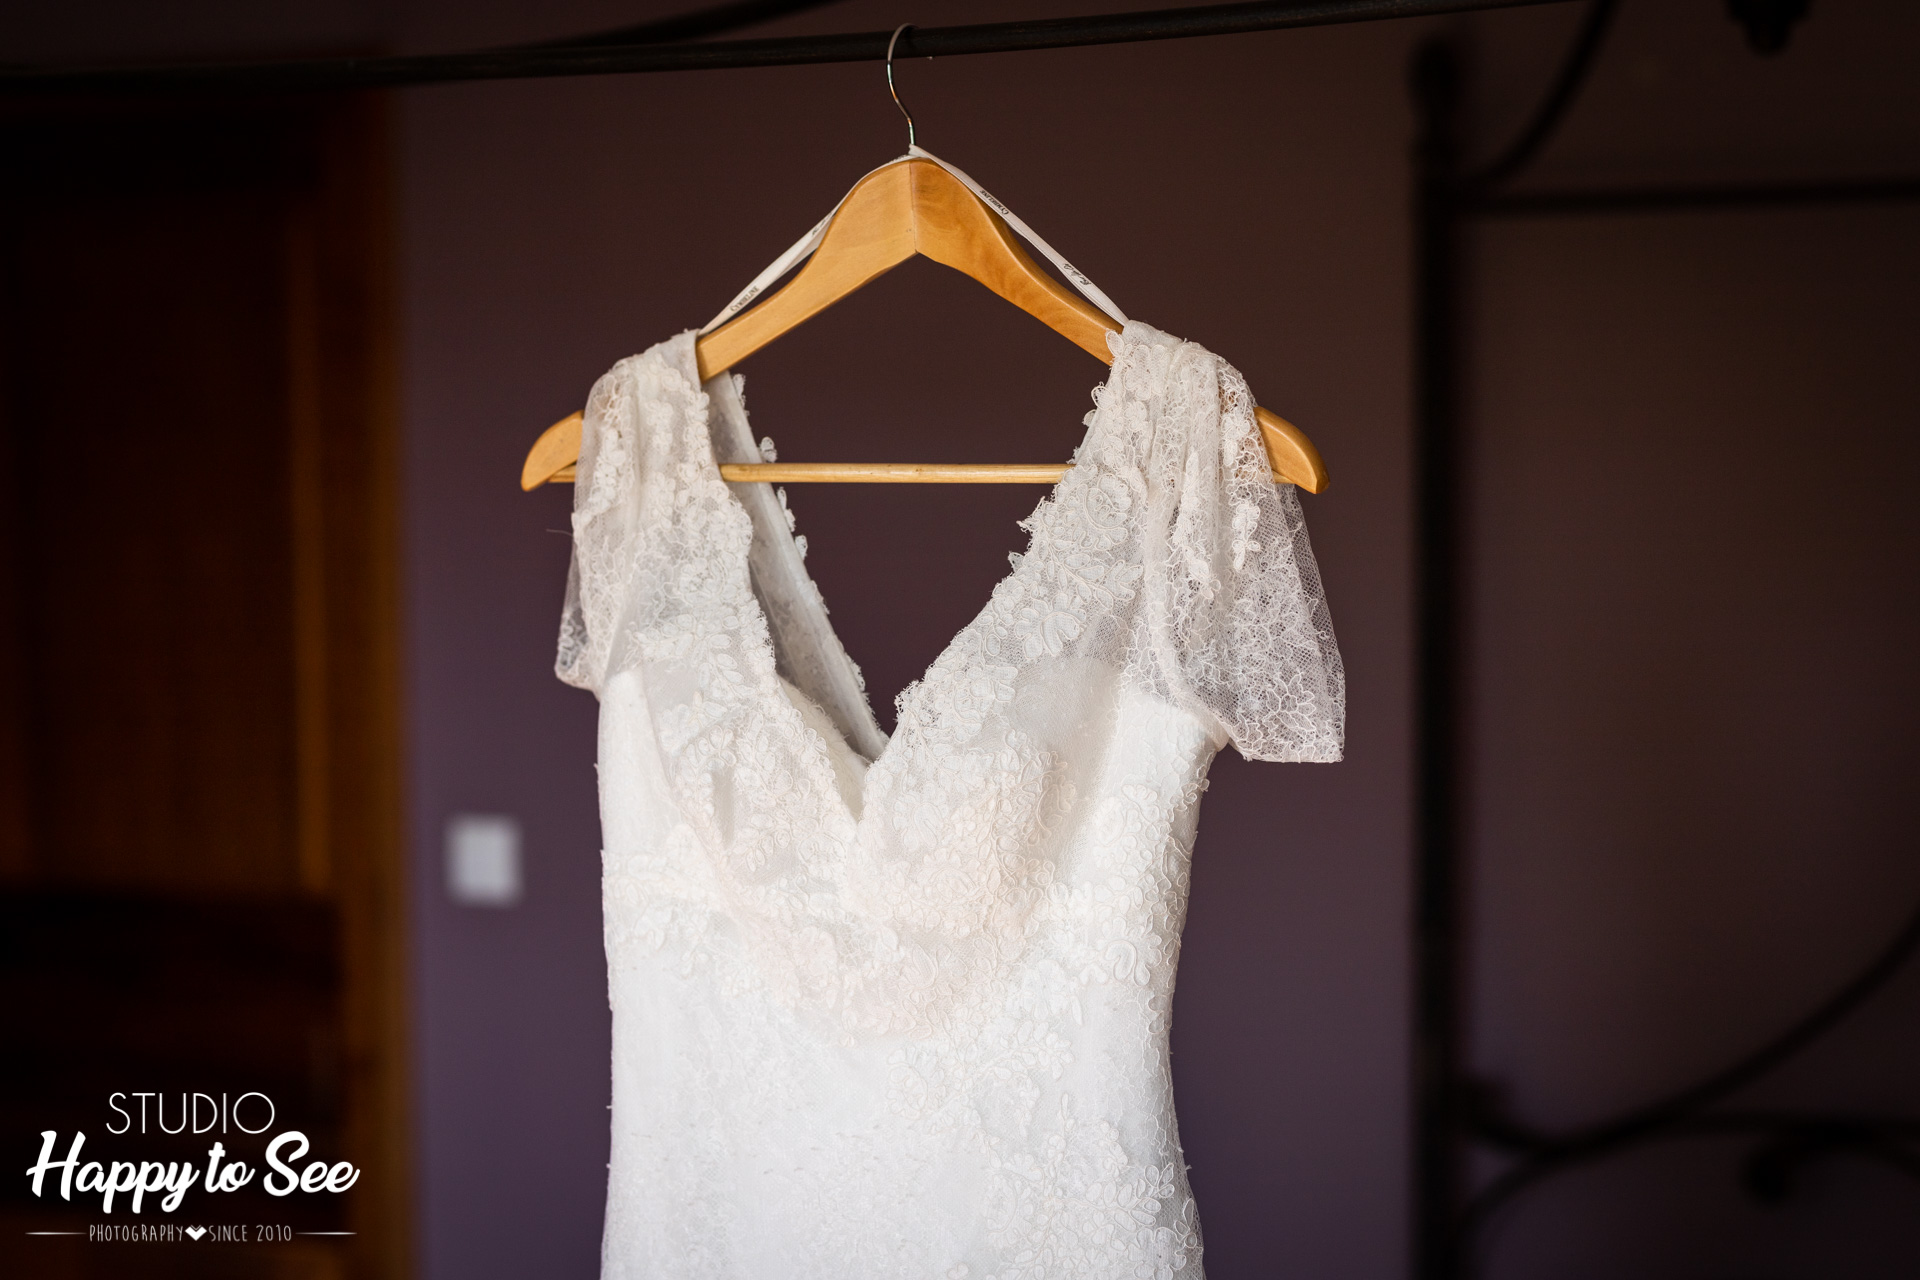 Mariage sur un air de Toscane preparatifs robe de mariee